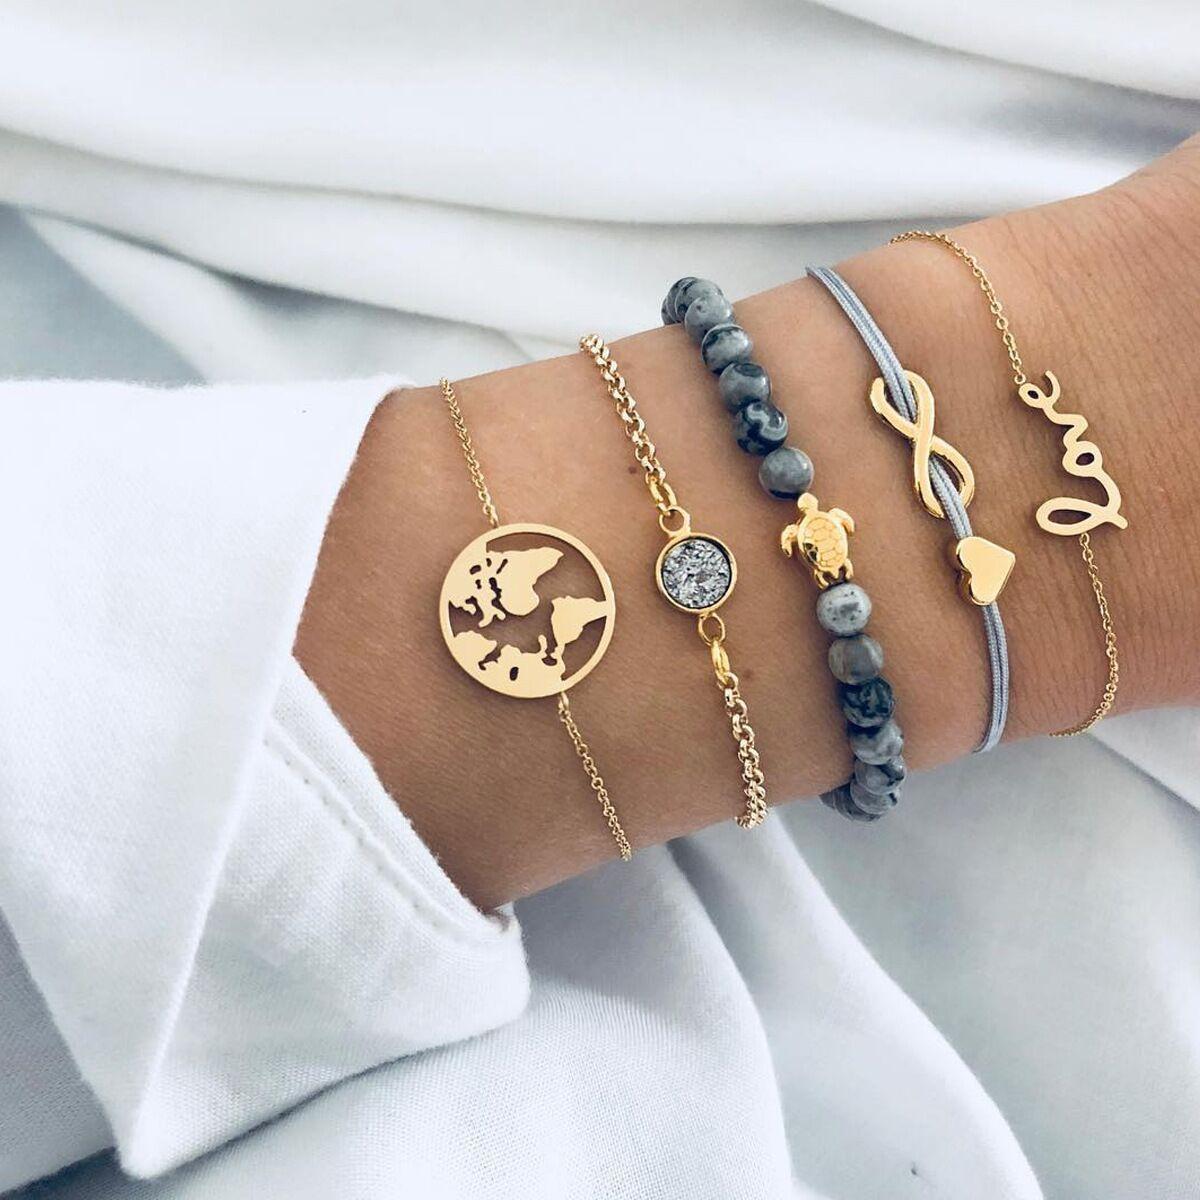 Set di braccialetti 5 paia Europa e America Nuova mappa dei braccialetti Set di braccialetti di moda a forma di cuore di amore di tartaruga